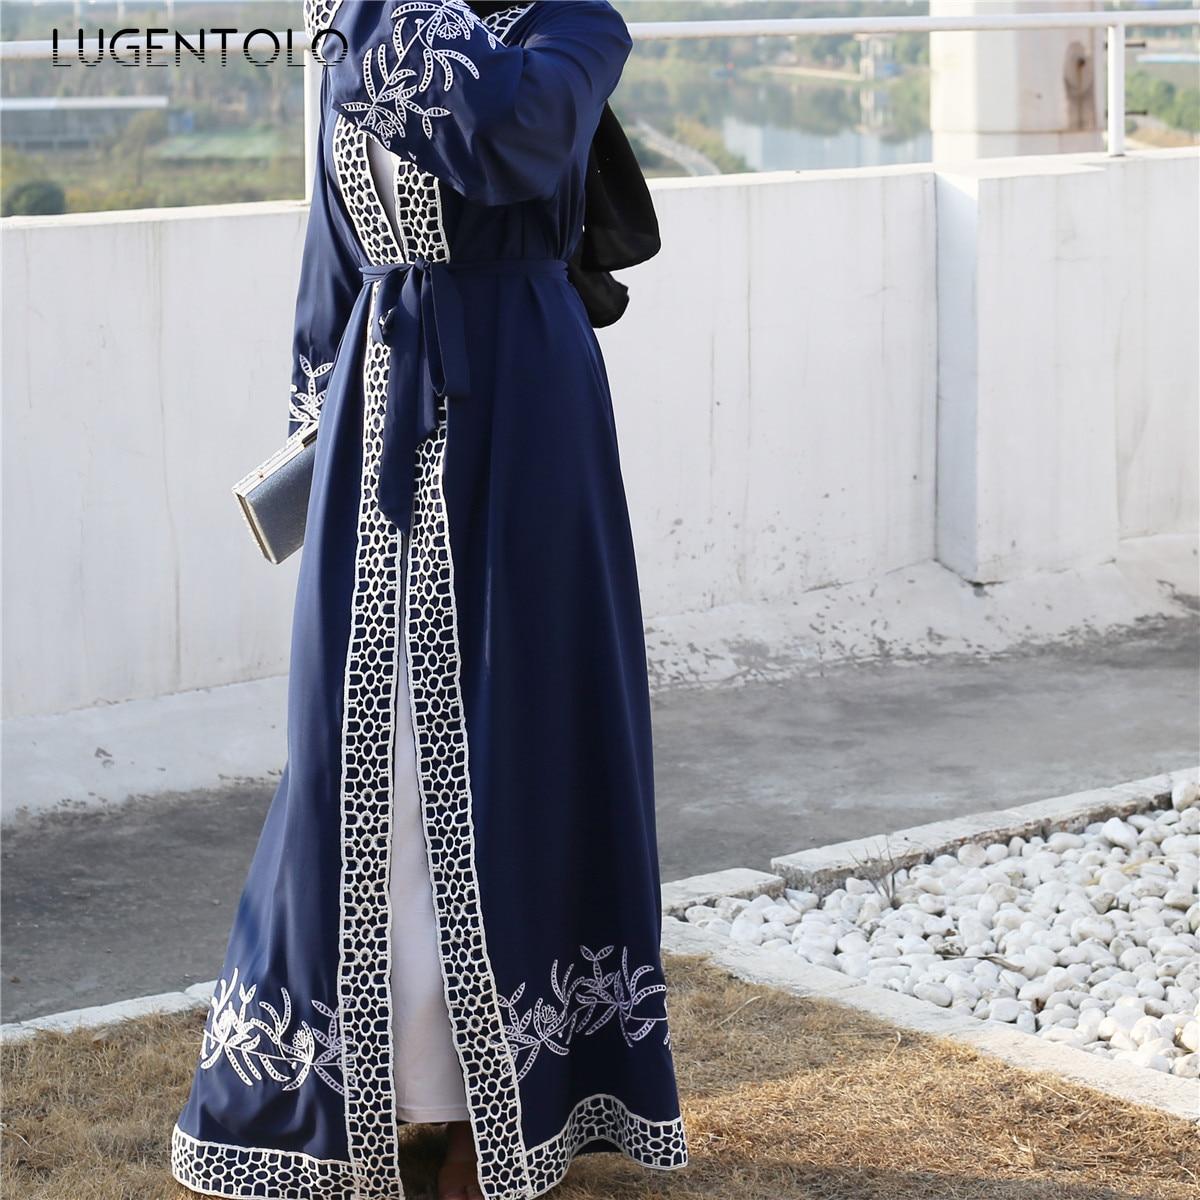 Lugentolo Elegant Women Long Dress Embroidered Stitching Lace Cardigan Fashion Muslim Dress Abaya Loose Casual Lady Maxi Dresses